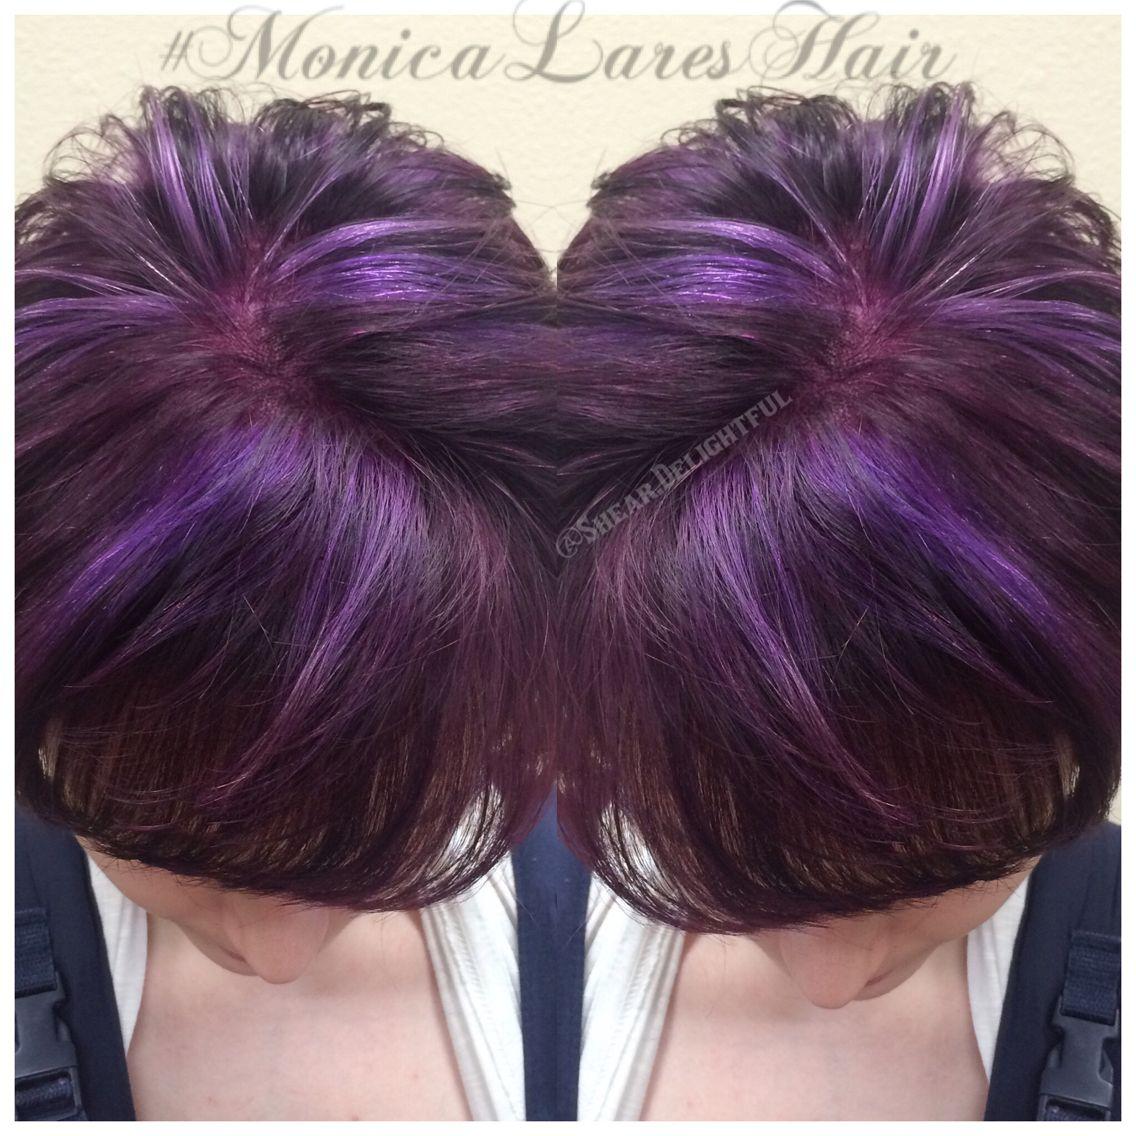 Plum purple hair with light purple highlights hair pinterest plum purple hair with light purple highlights pmusecretfo Choice Image